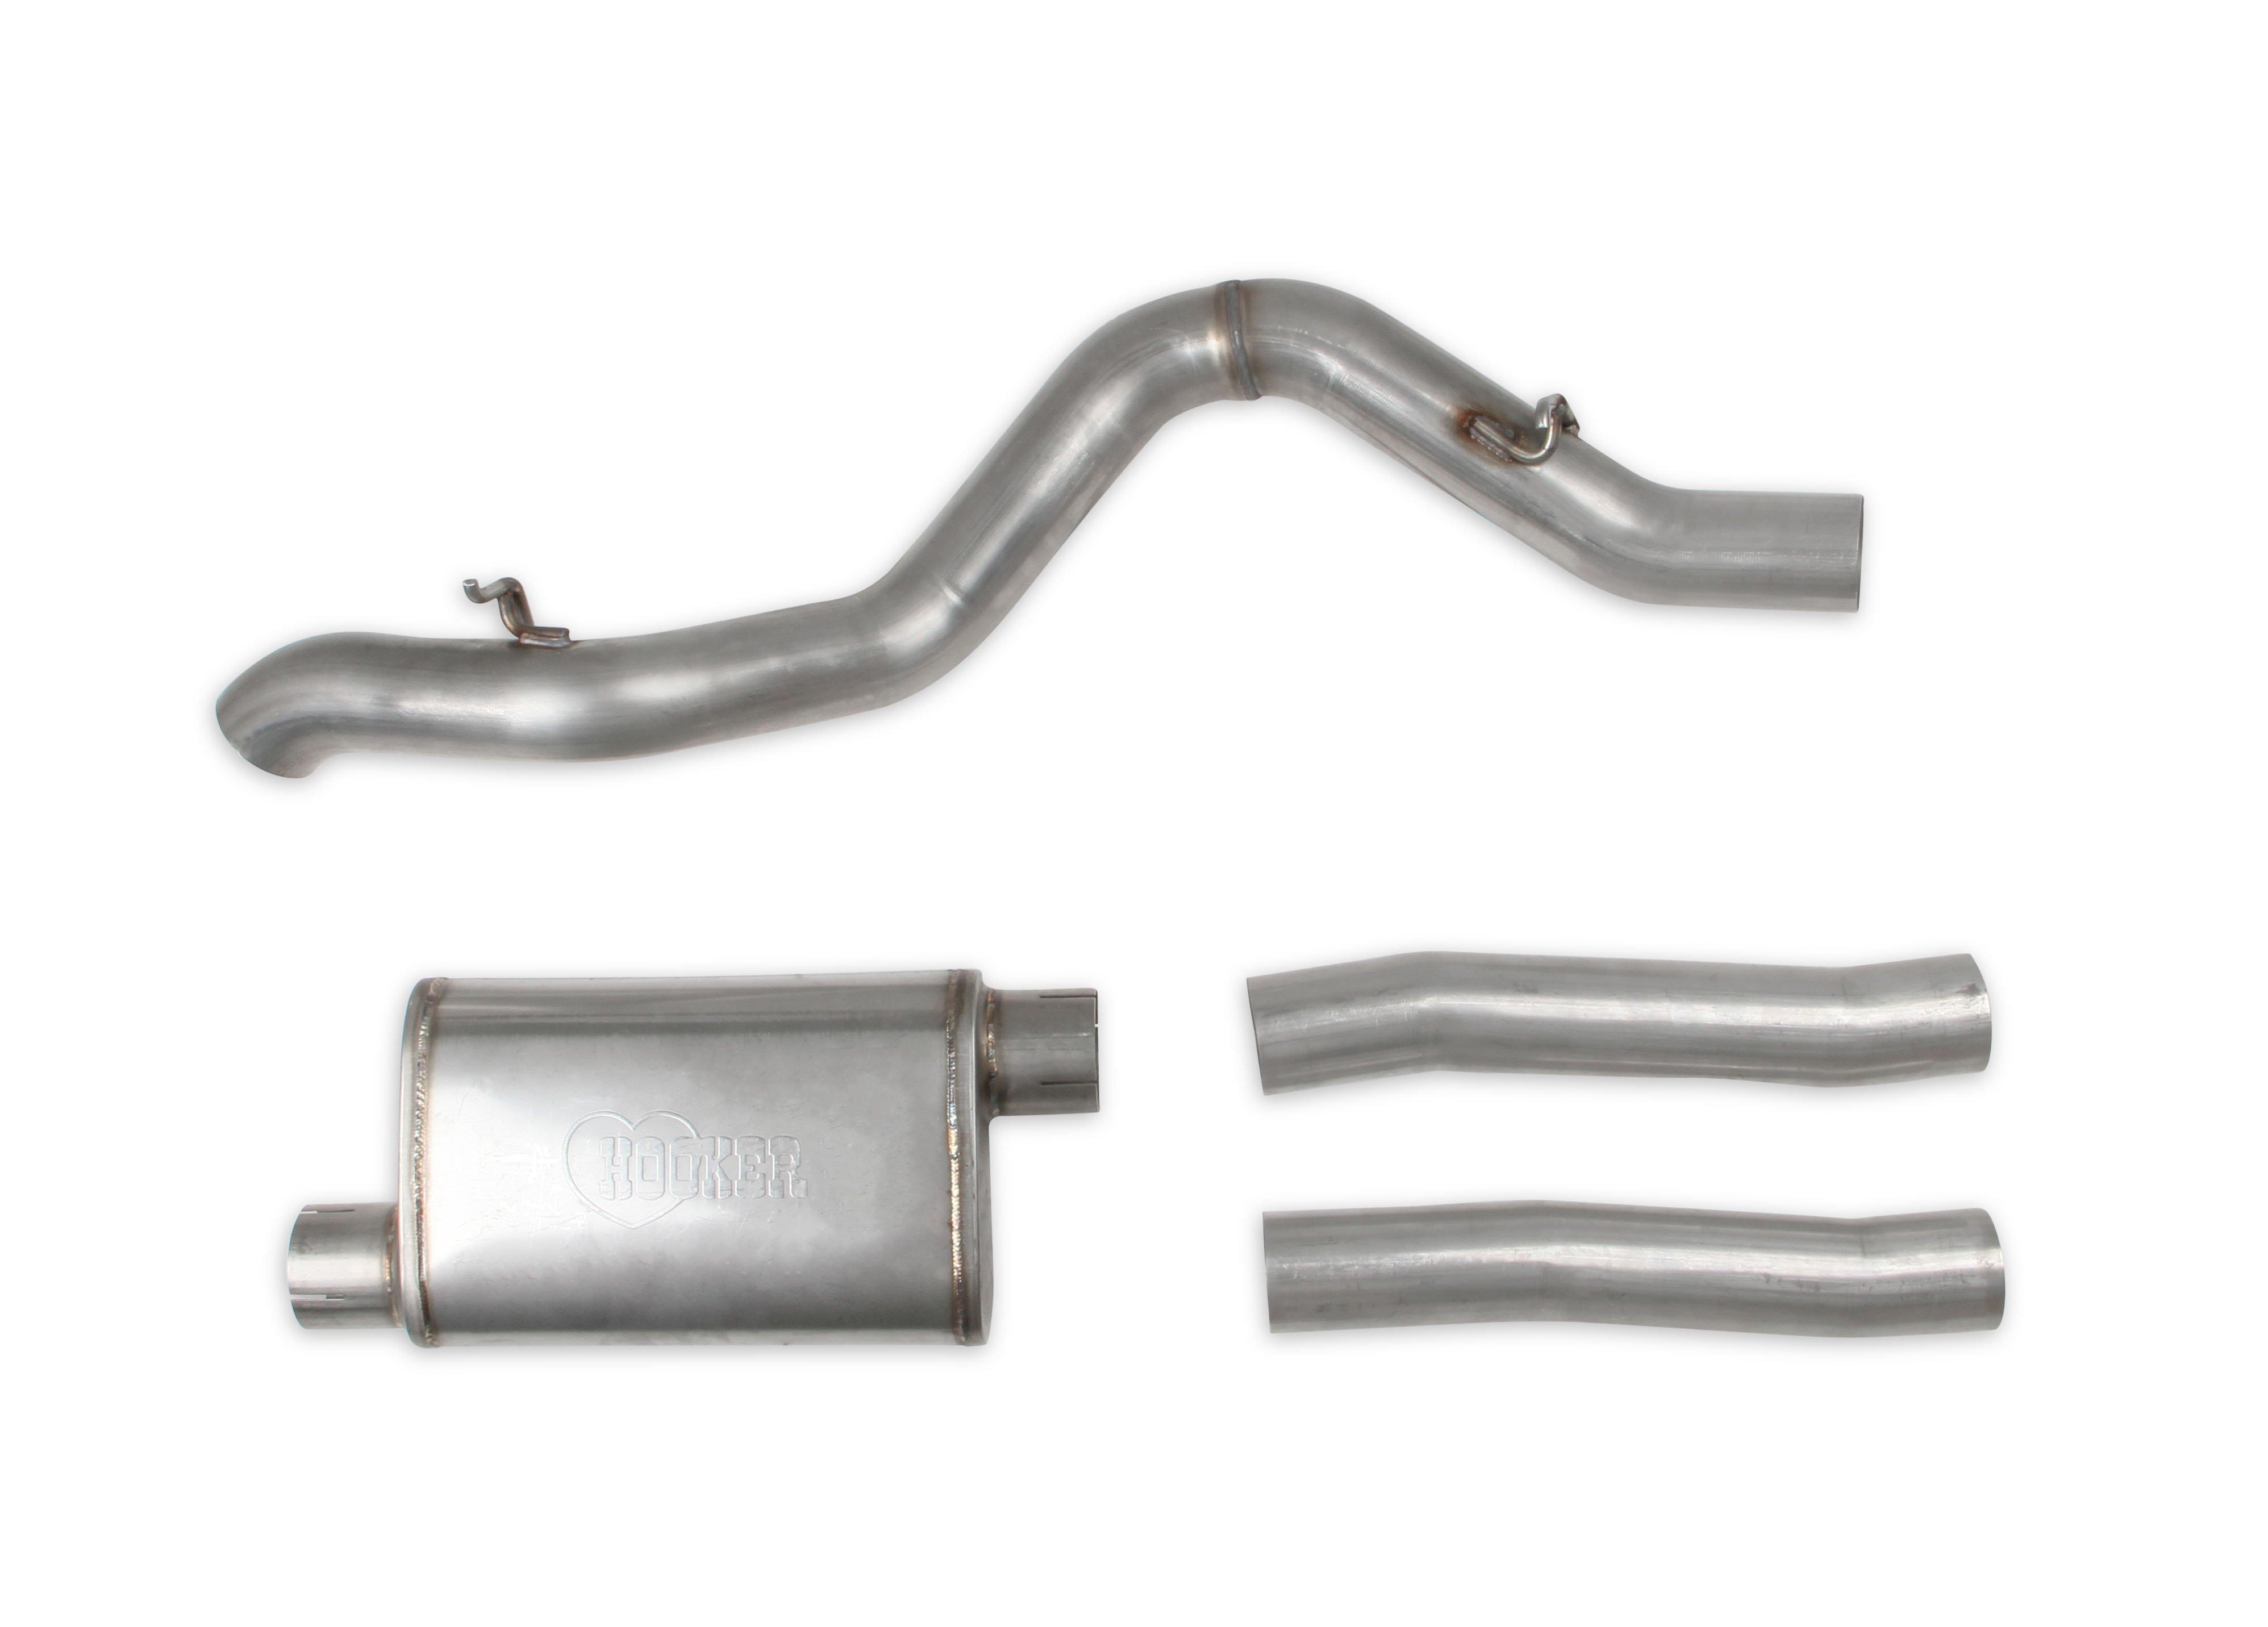 hooker blackheart engine swap exhaust system